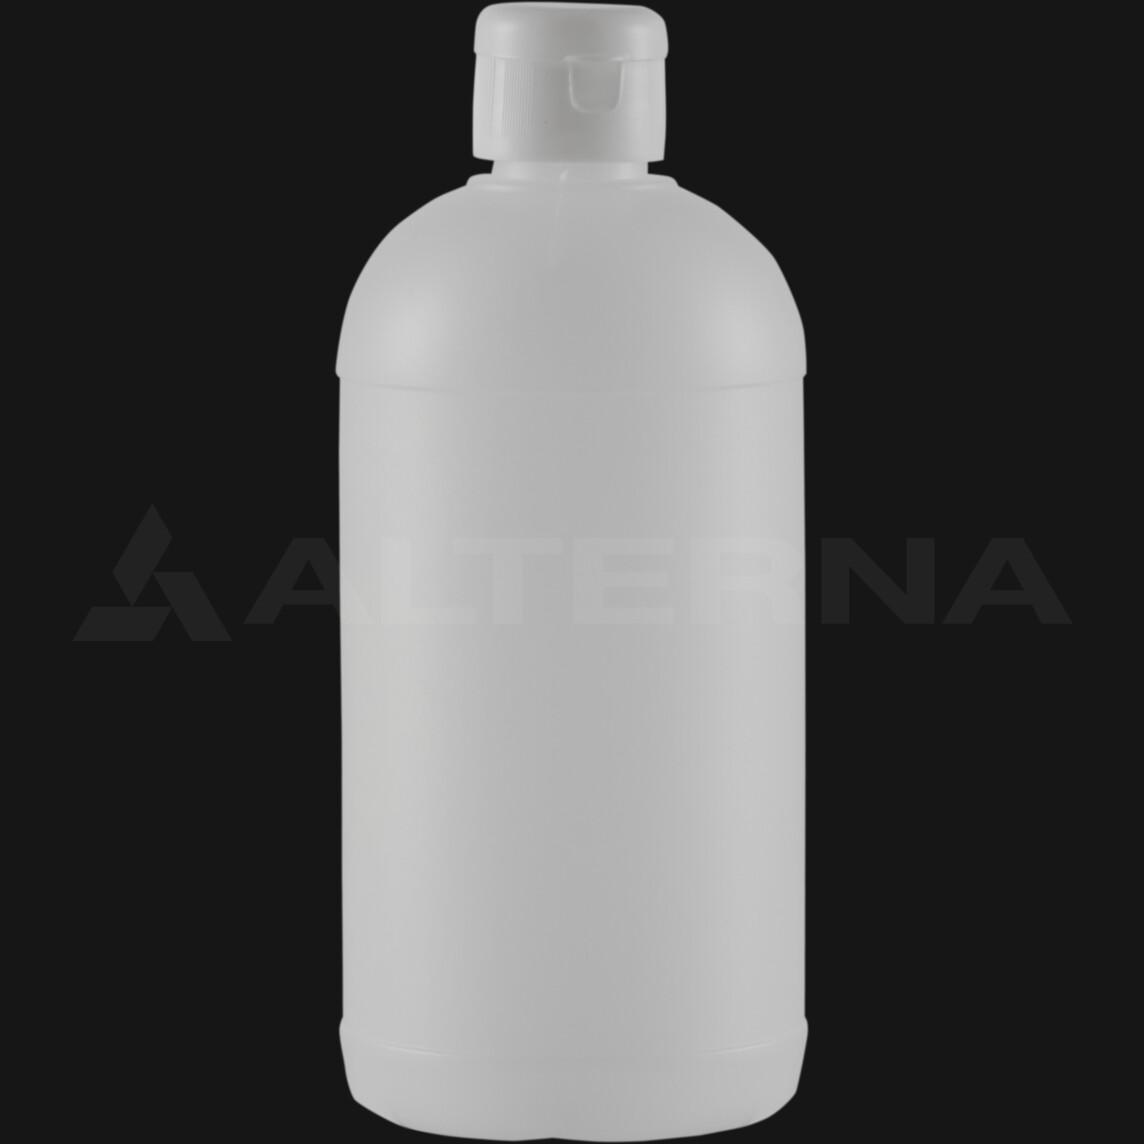 500 ml HDPE Bottle with 28 mm Flip Top Cap